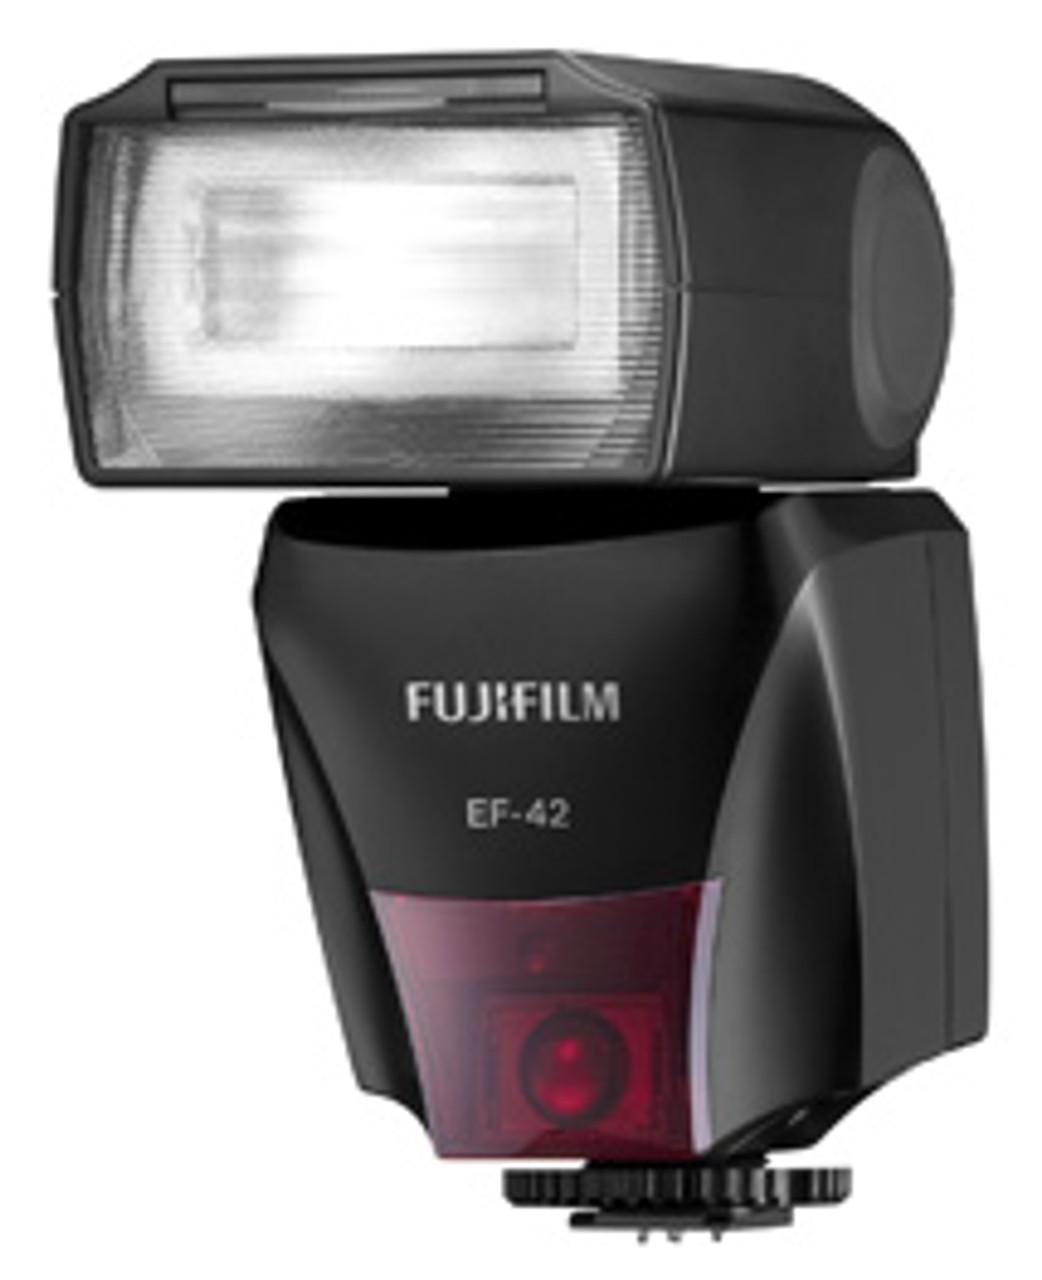 Fujifilm Shoe Mount Flash EF-42